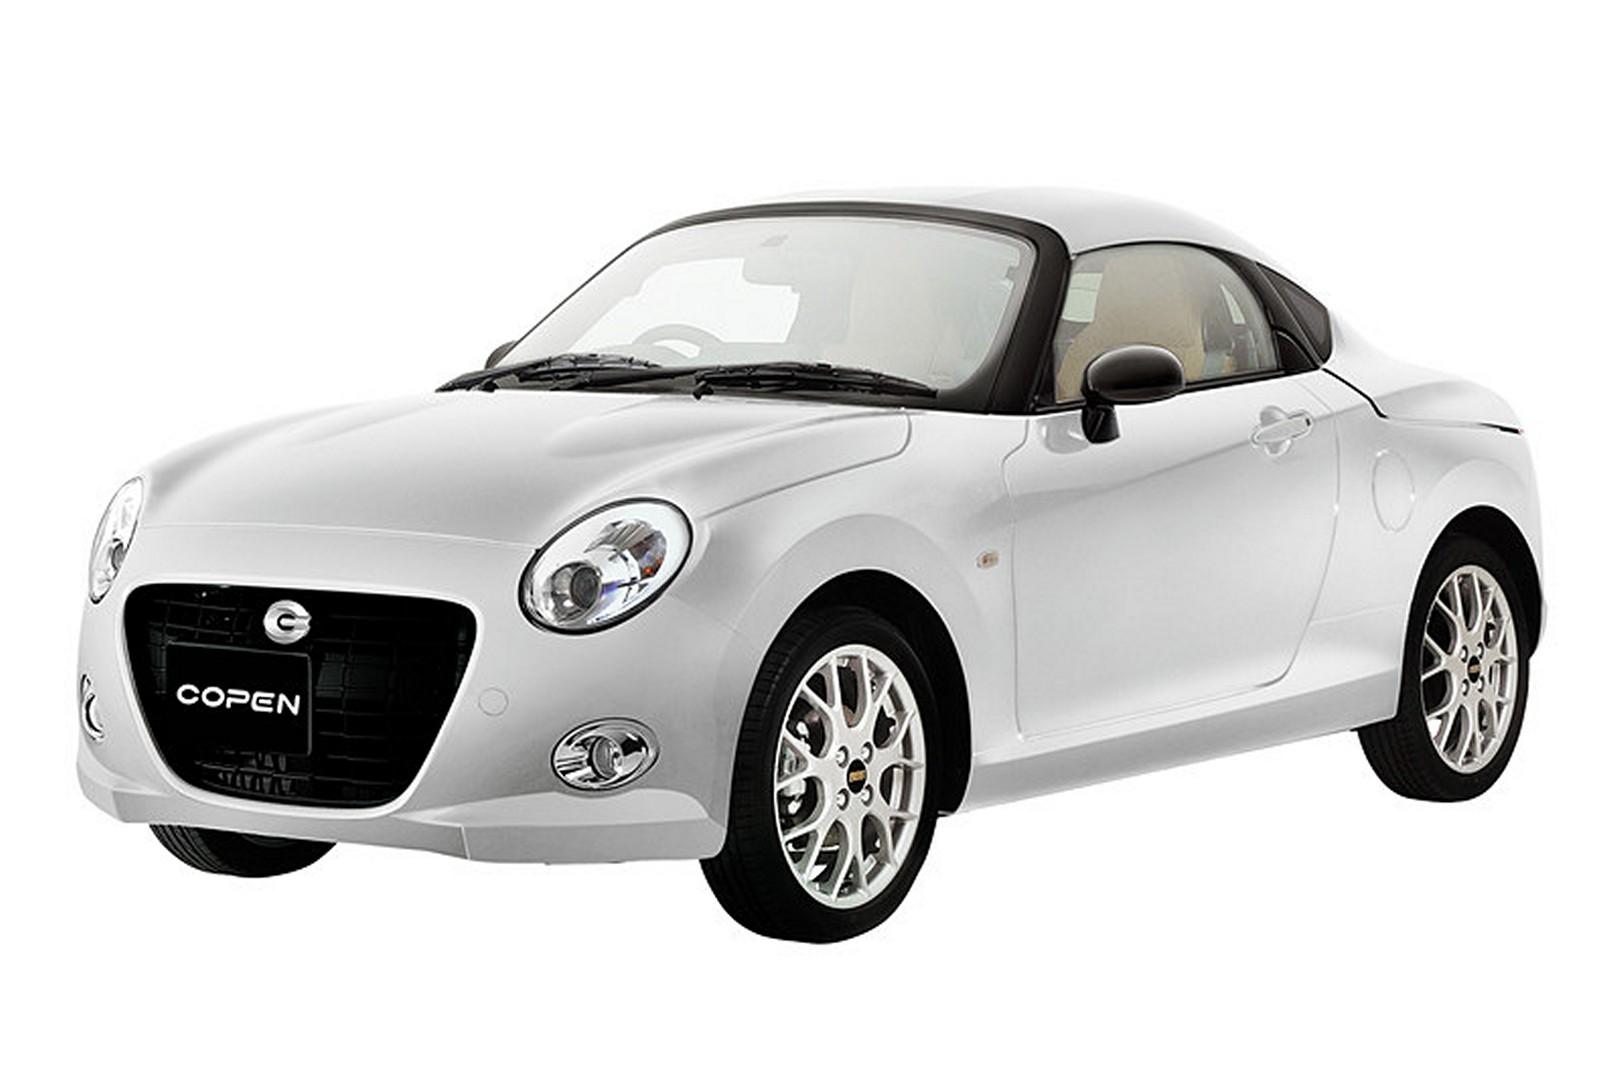 2019-daihatsu-copen-coupe-looks-like-a-budget-alfa-4c-or-alpine-a110_6